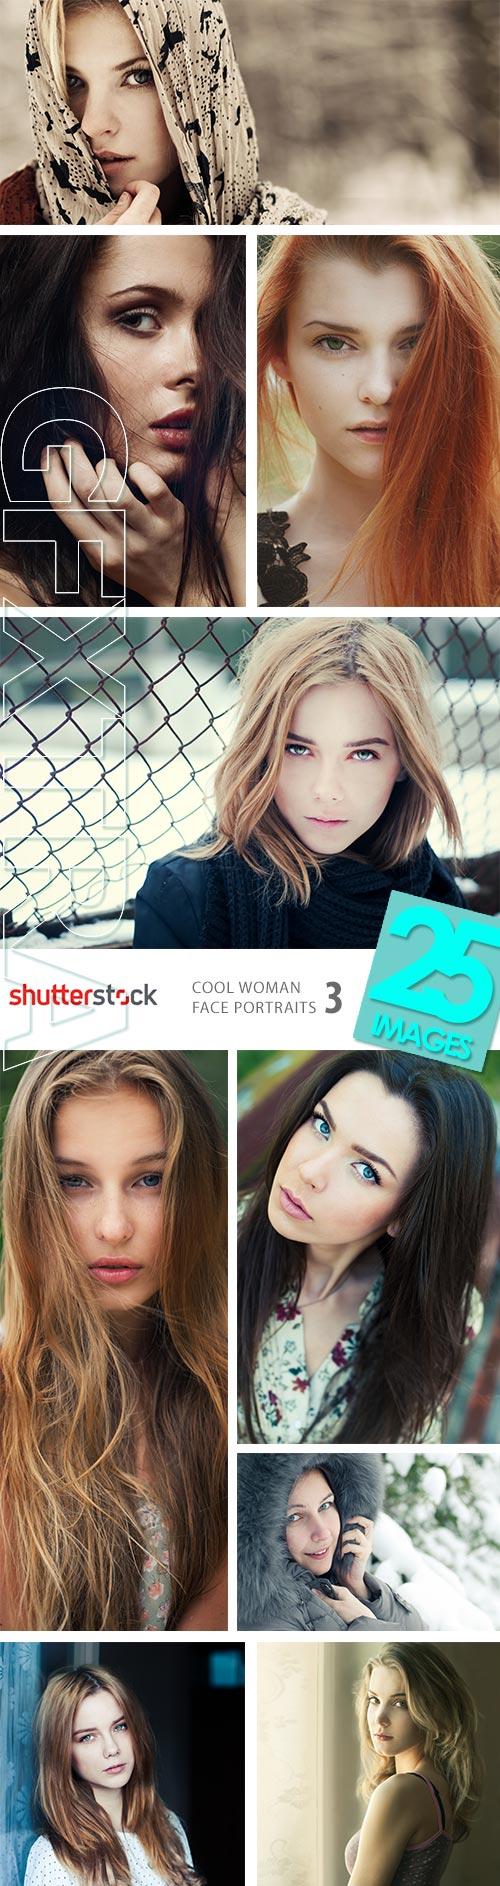 Cool Woman Face Portraits III, 25xJPGs